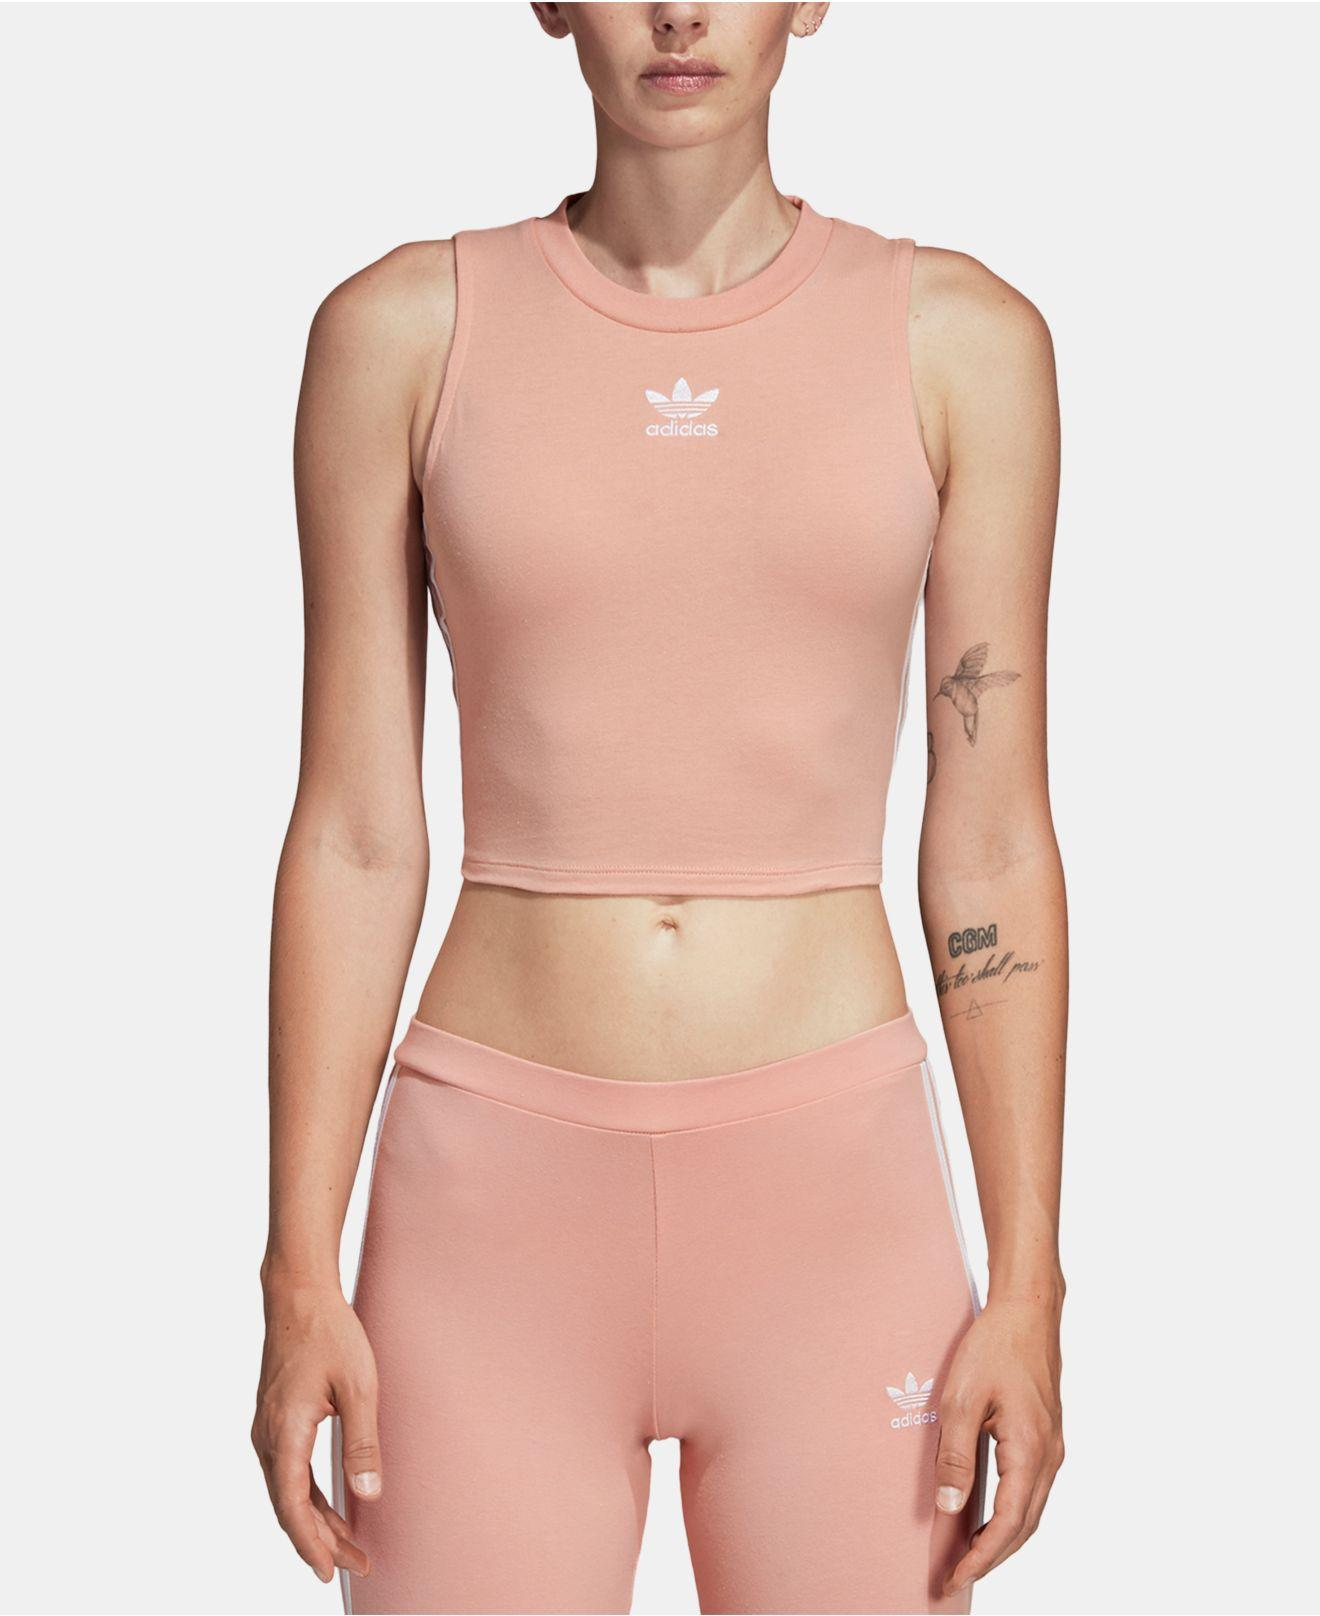 adidas Originals adidas Originals adicolor three stripe cropped tank in pink Pink from ASOS (USA) | People